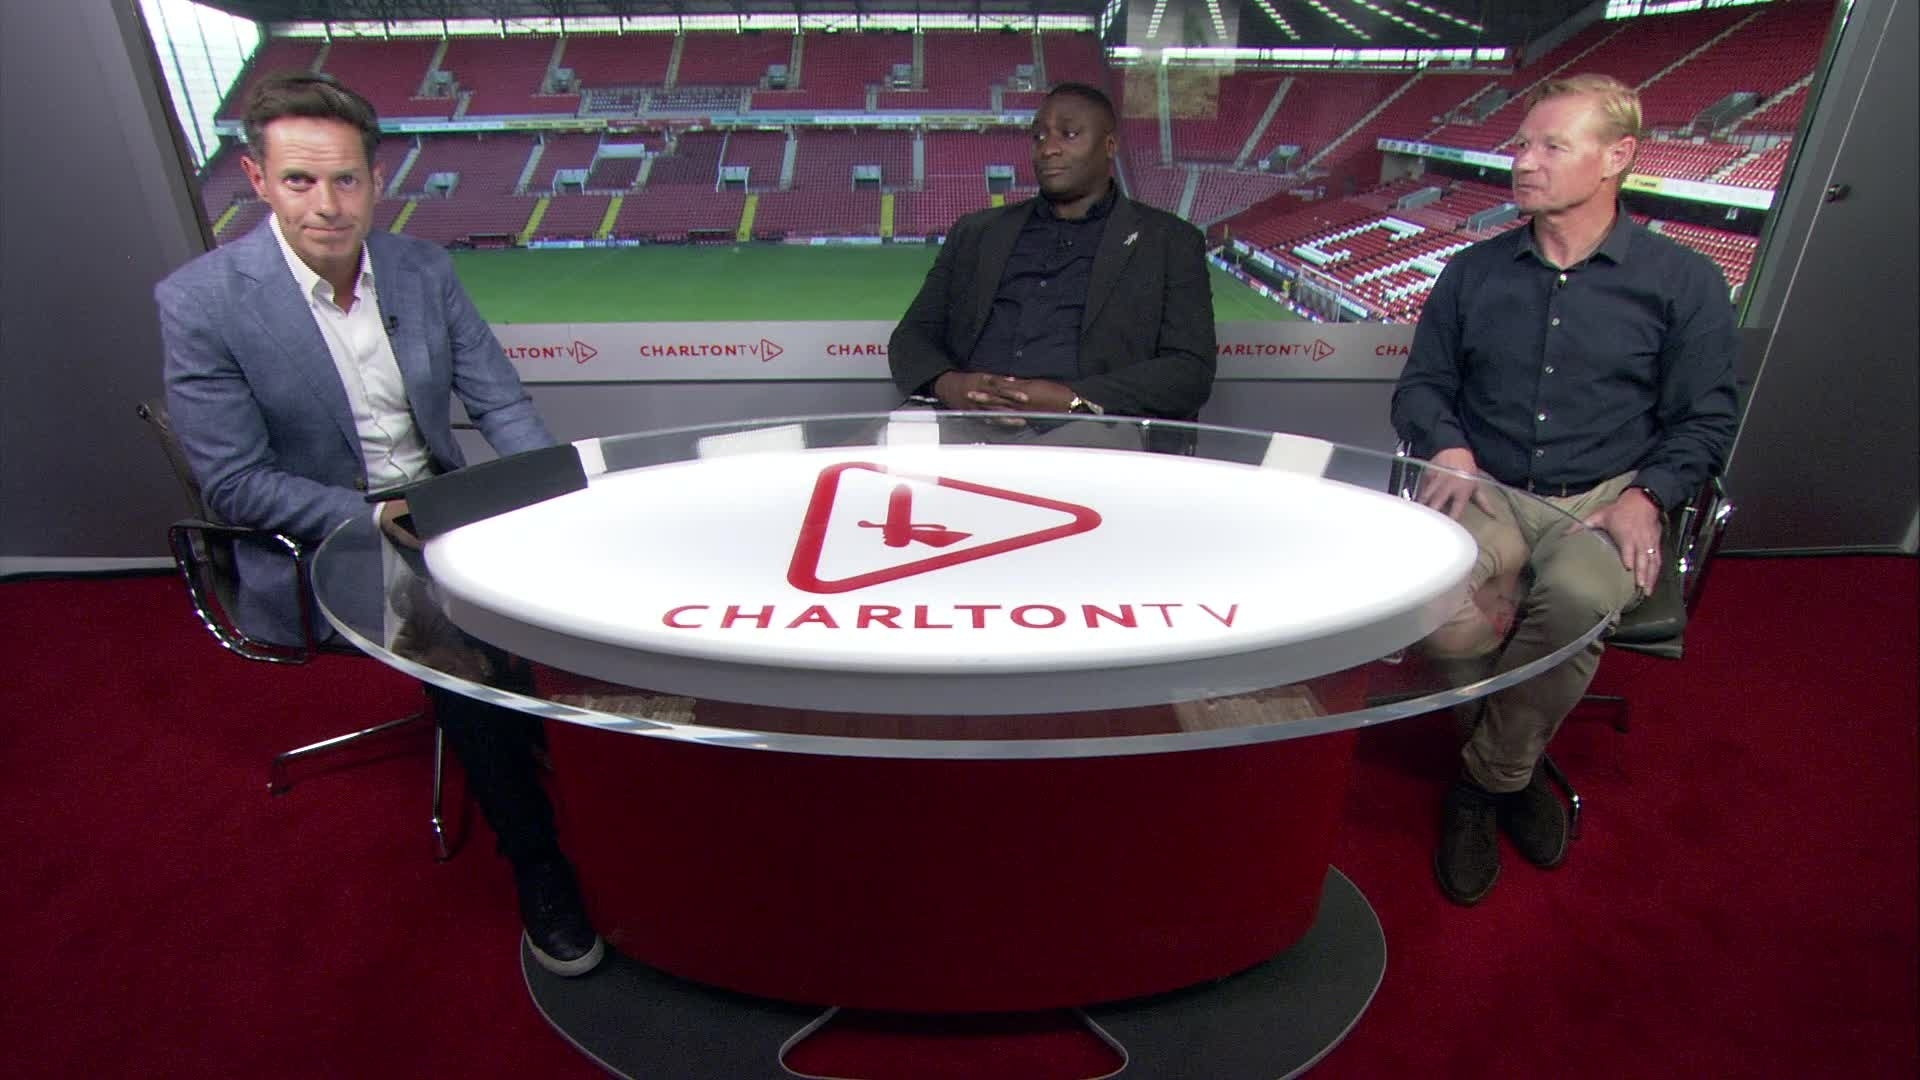 Nigel Adkins post-Oxford United interview (August 2021)